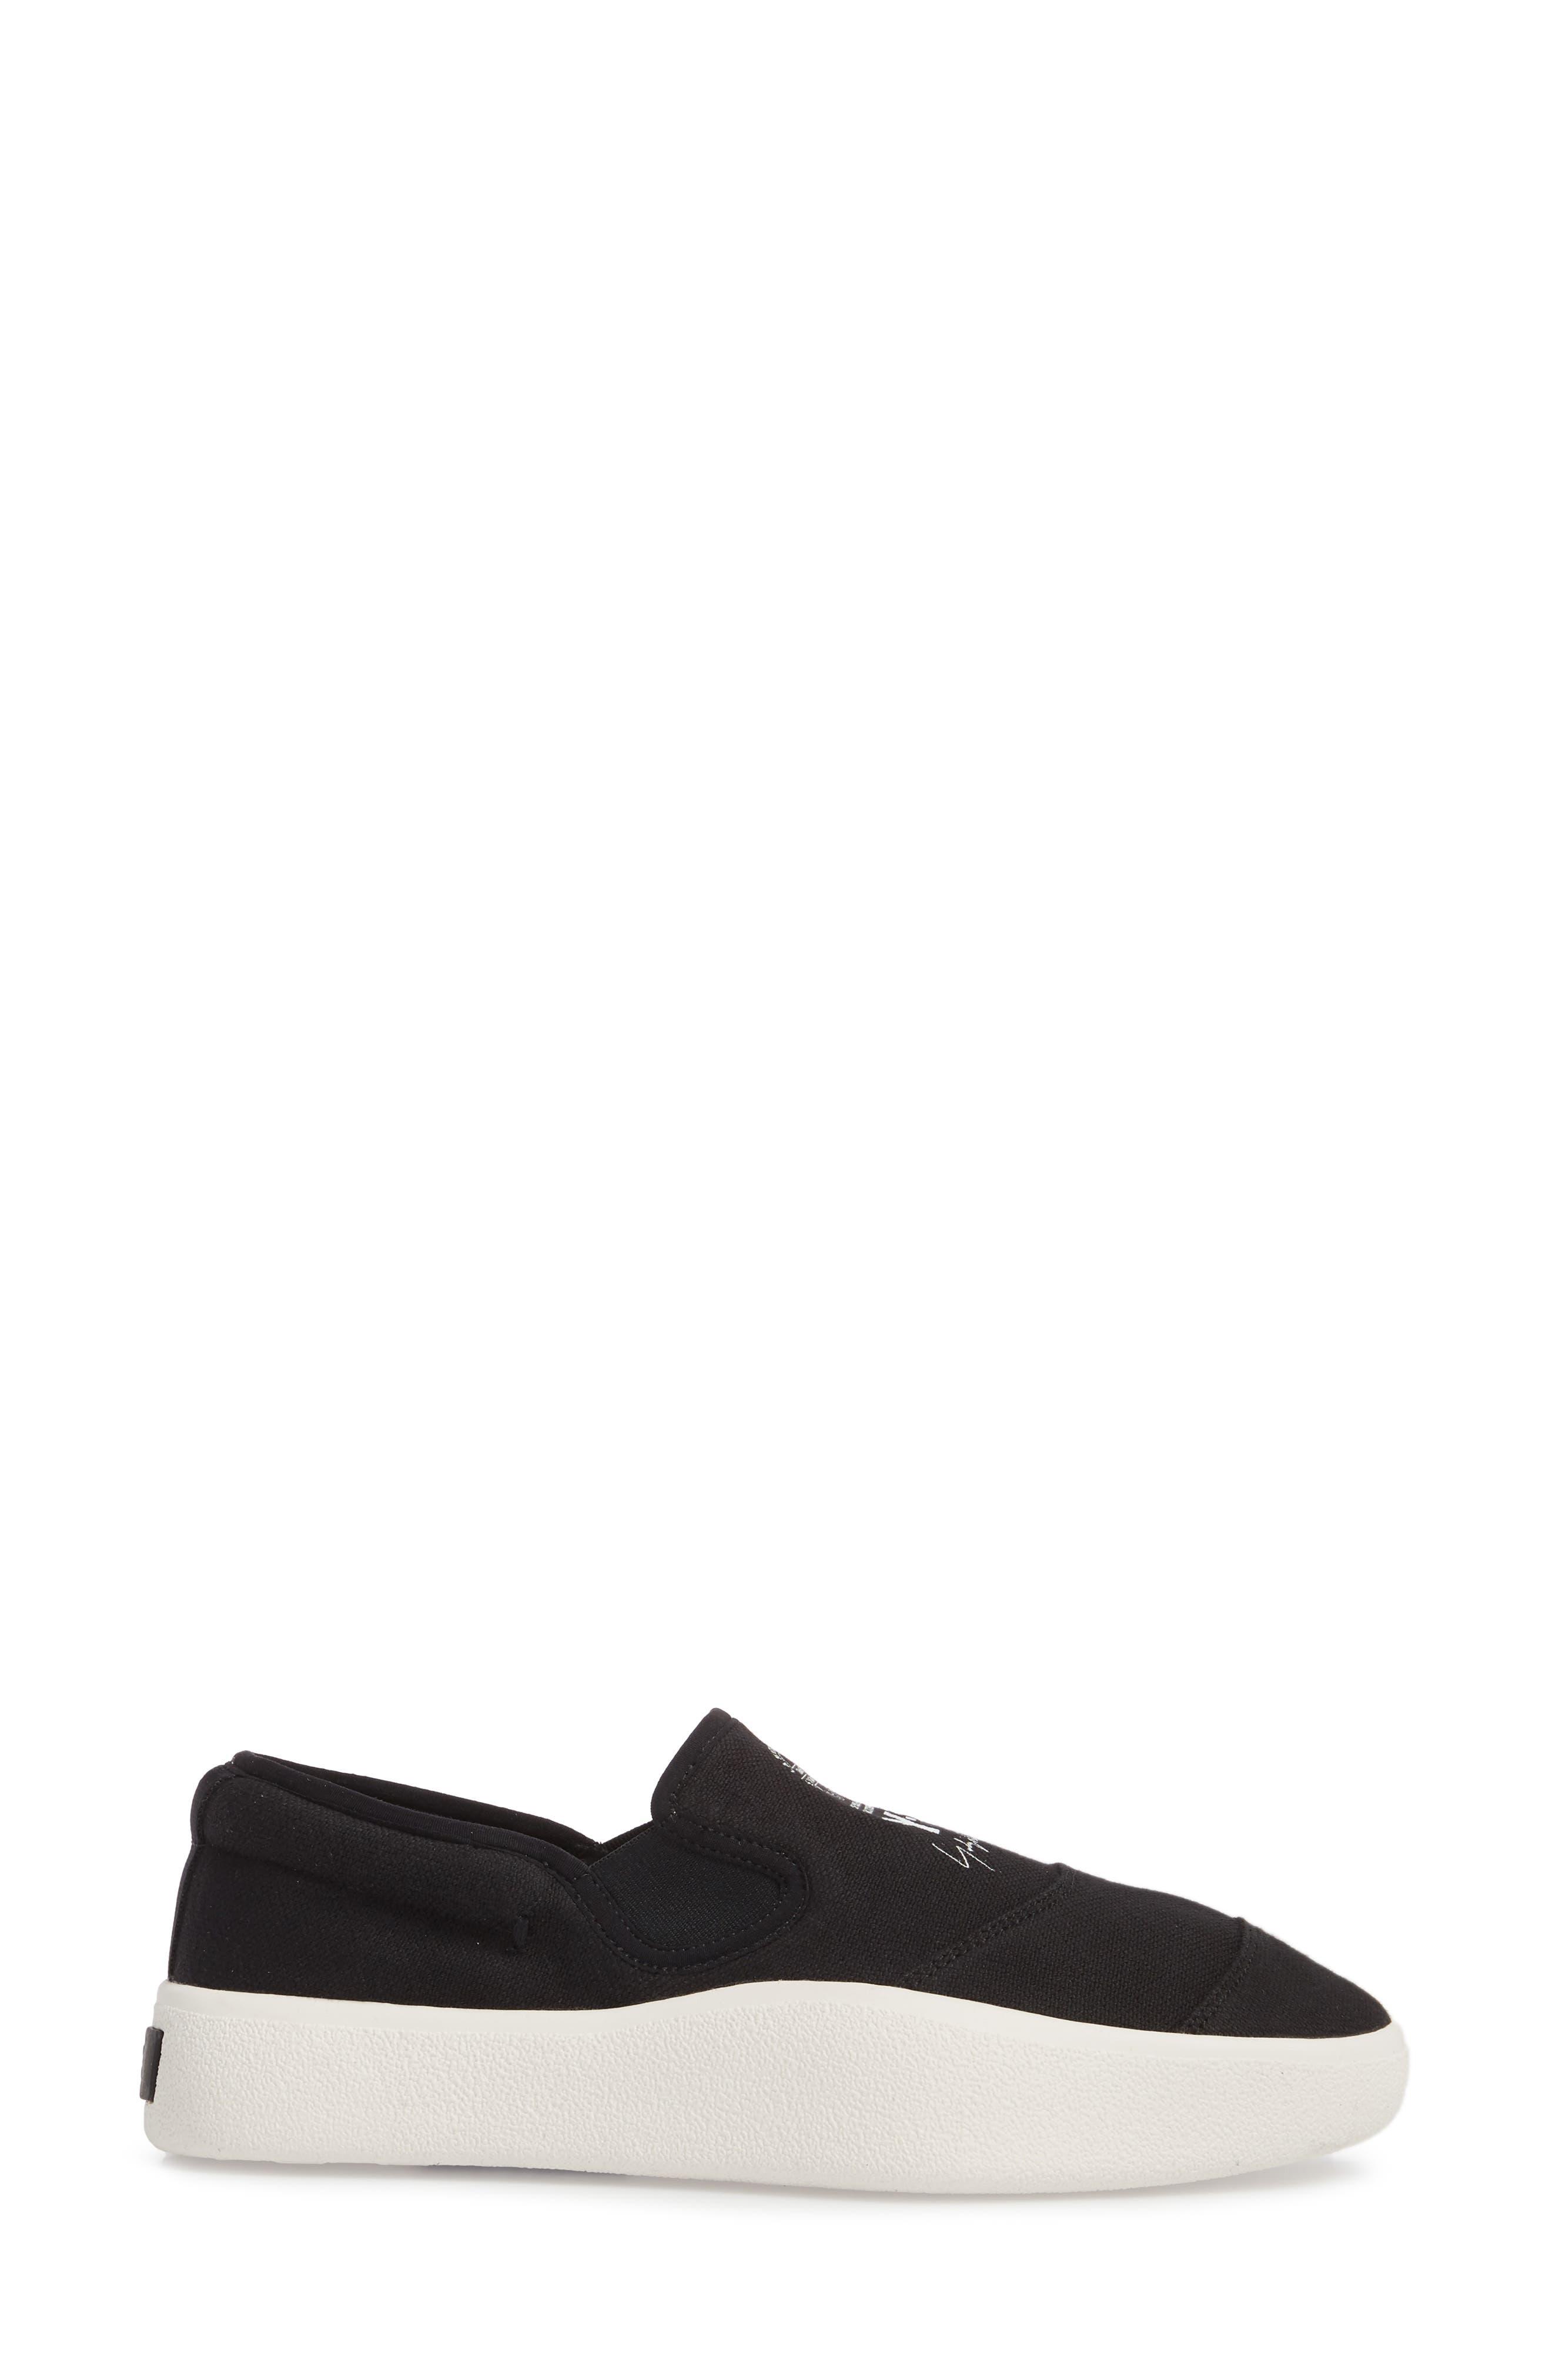 Tangutsu Slip-On Sneaker,                             Alternate thumbnail 3, color,                             001